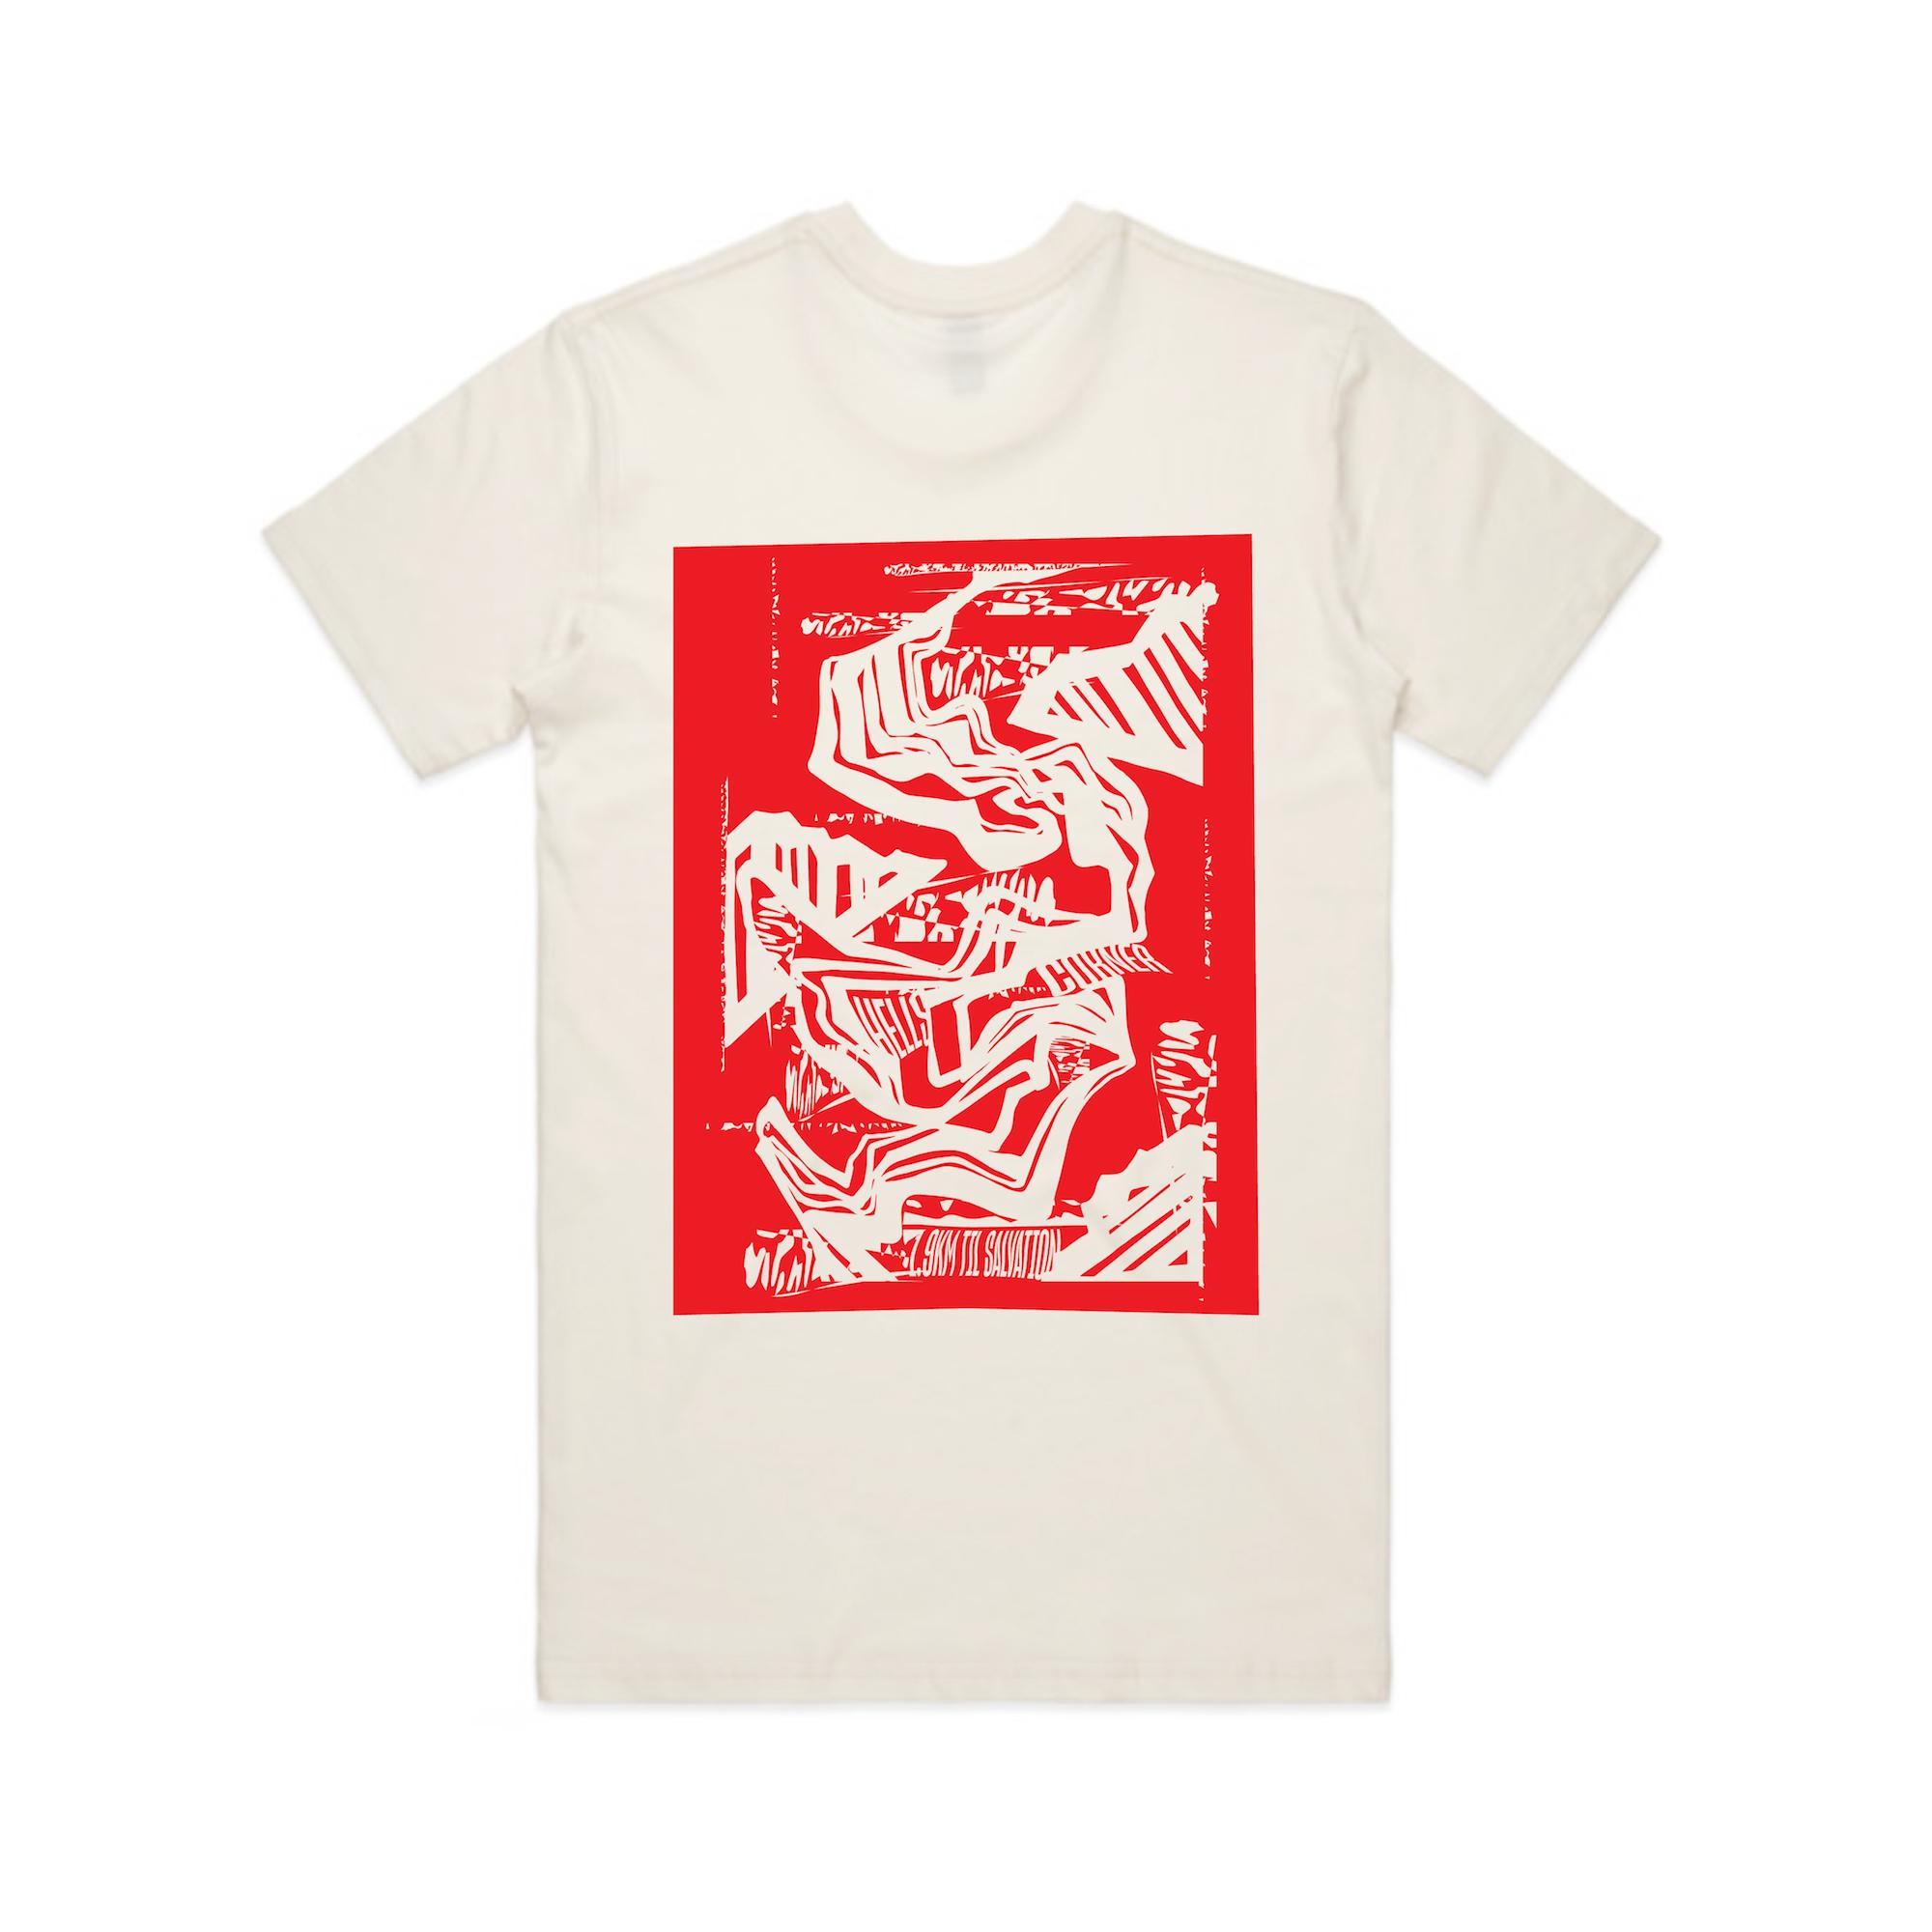 Mount Buller T-Shirt Product Low 1.jpg